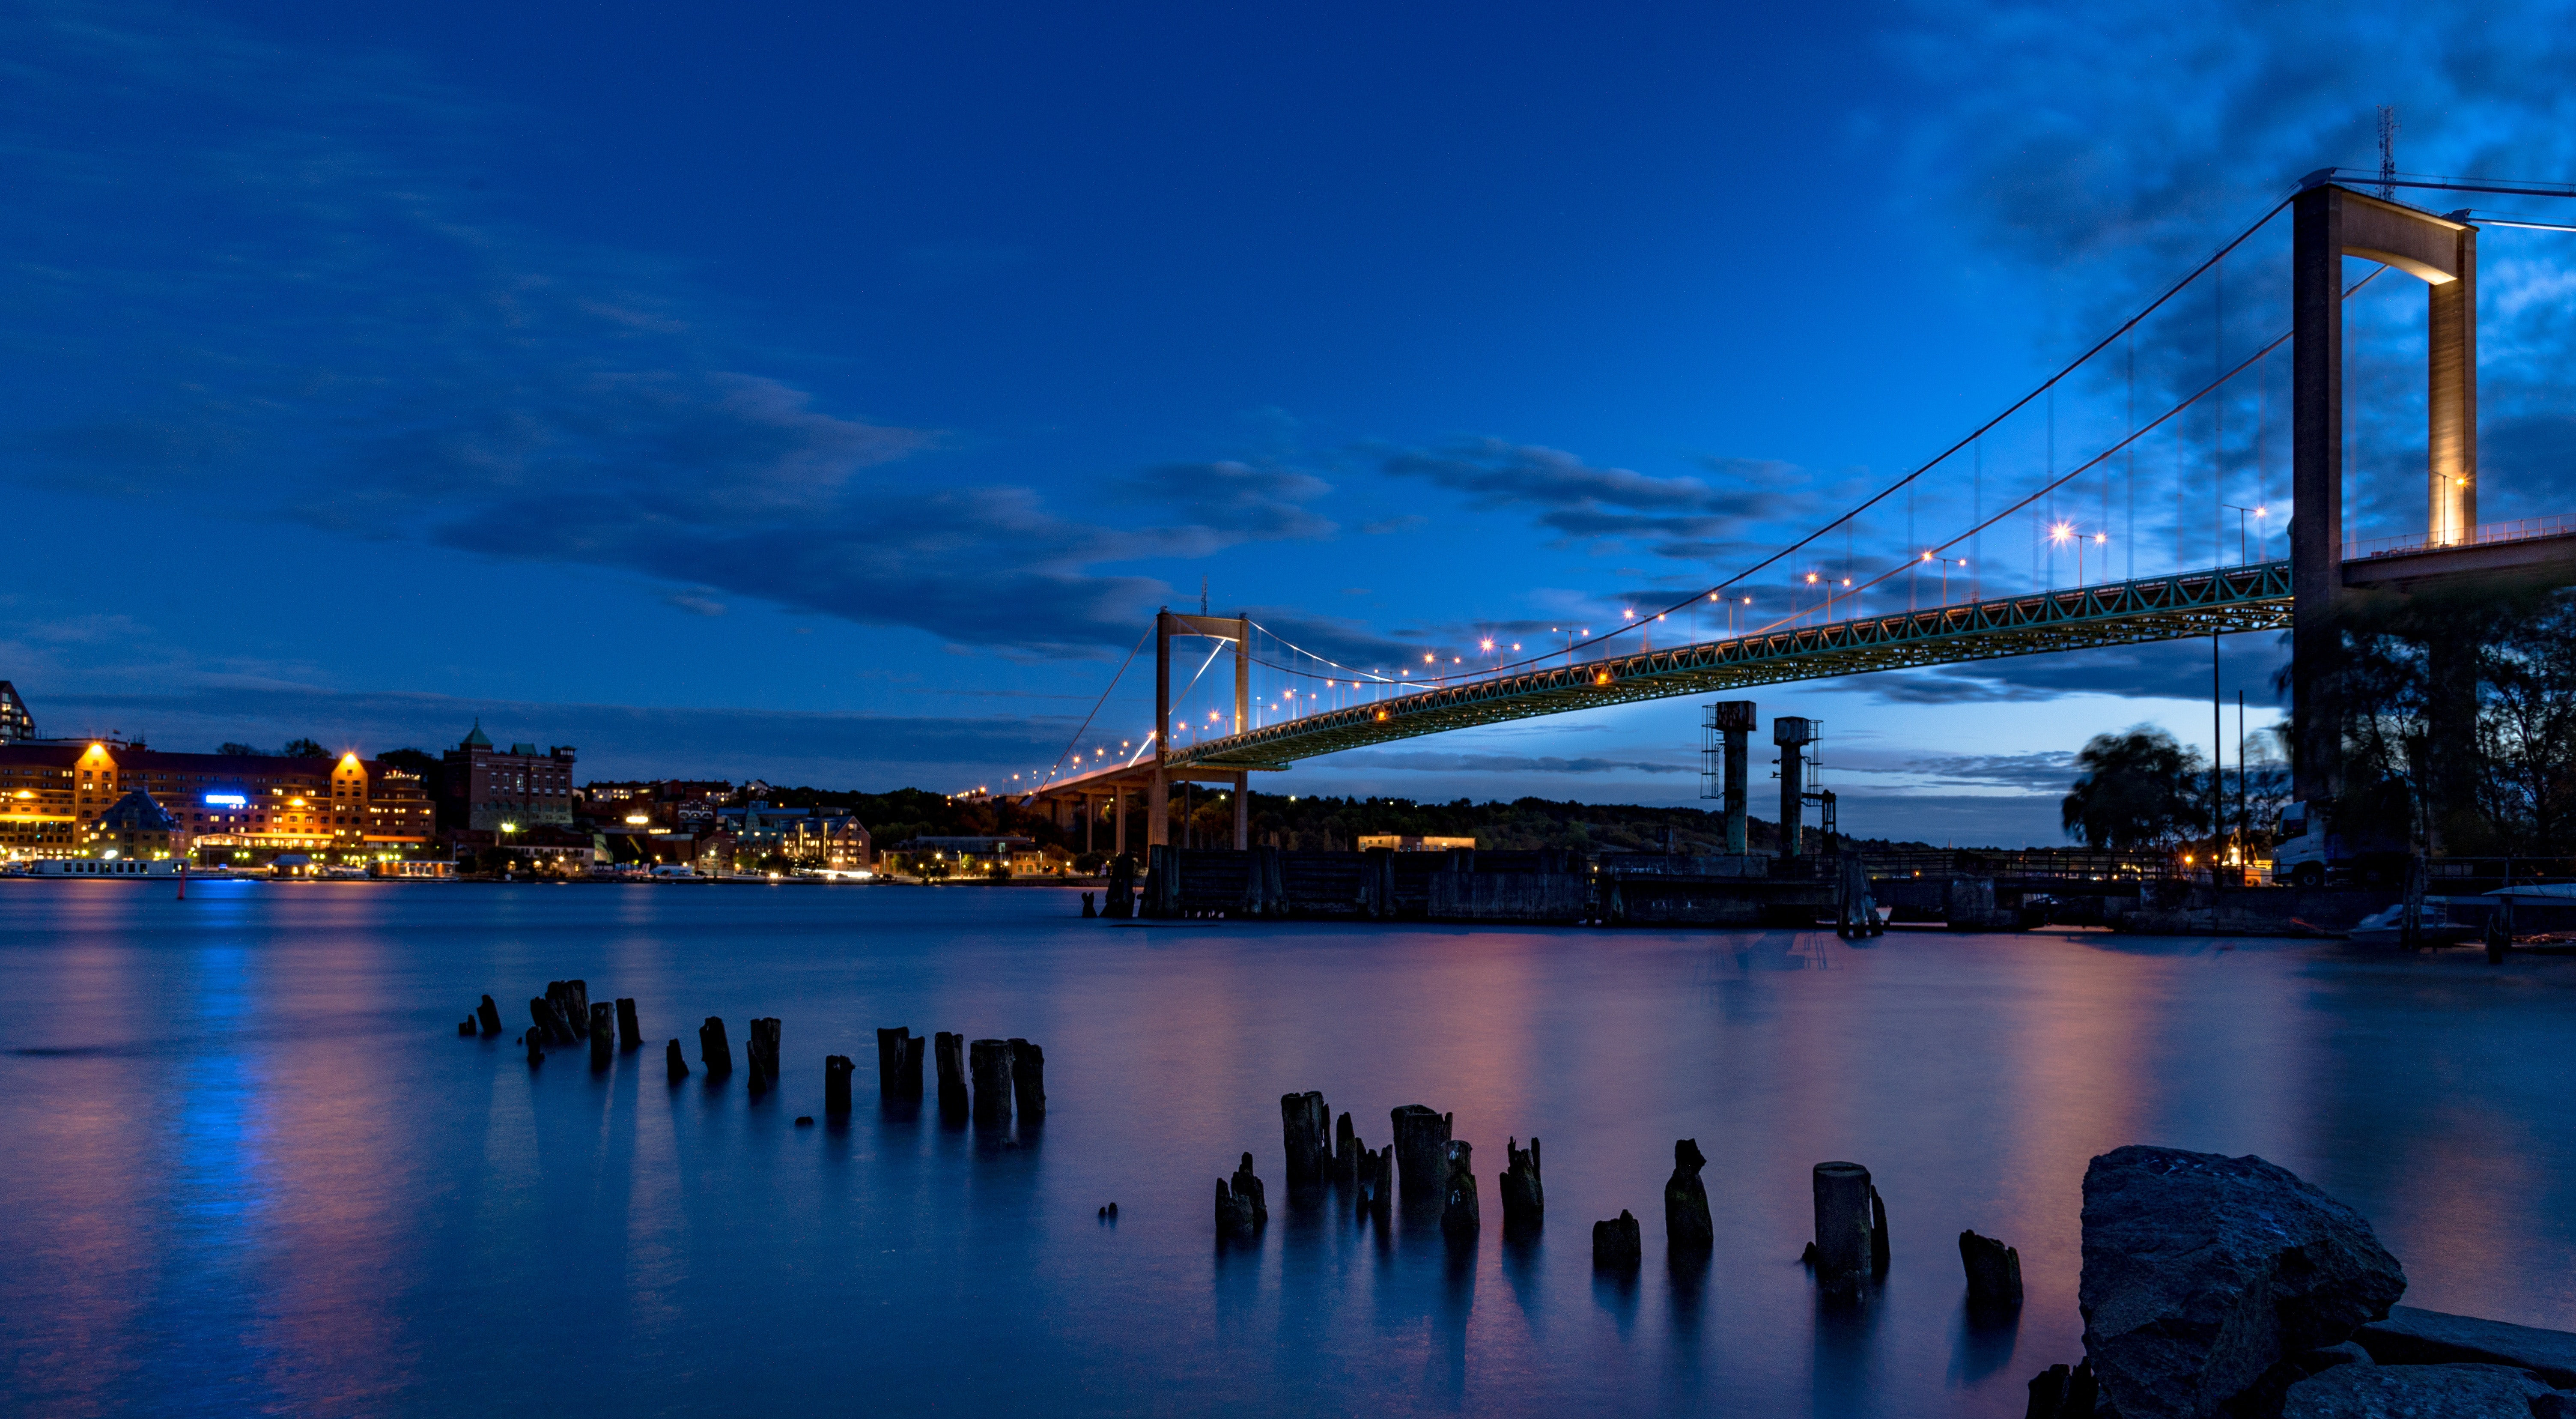 View of body of water below city suspension bridge photo